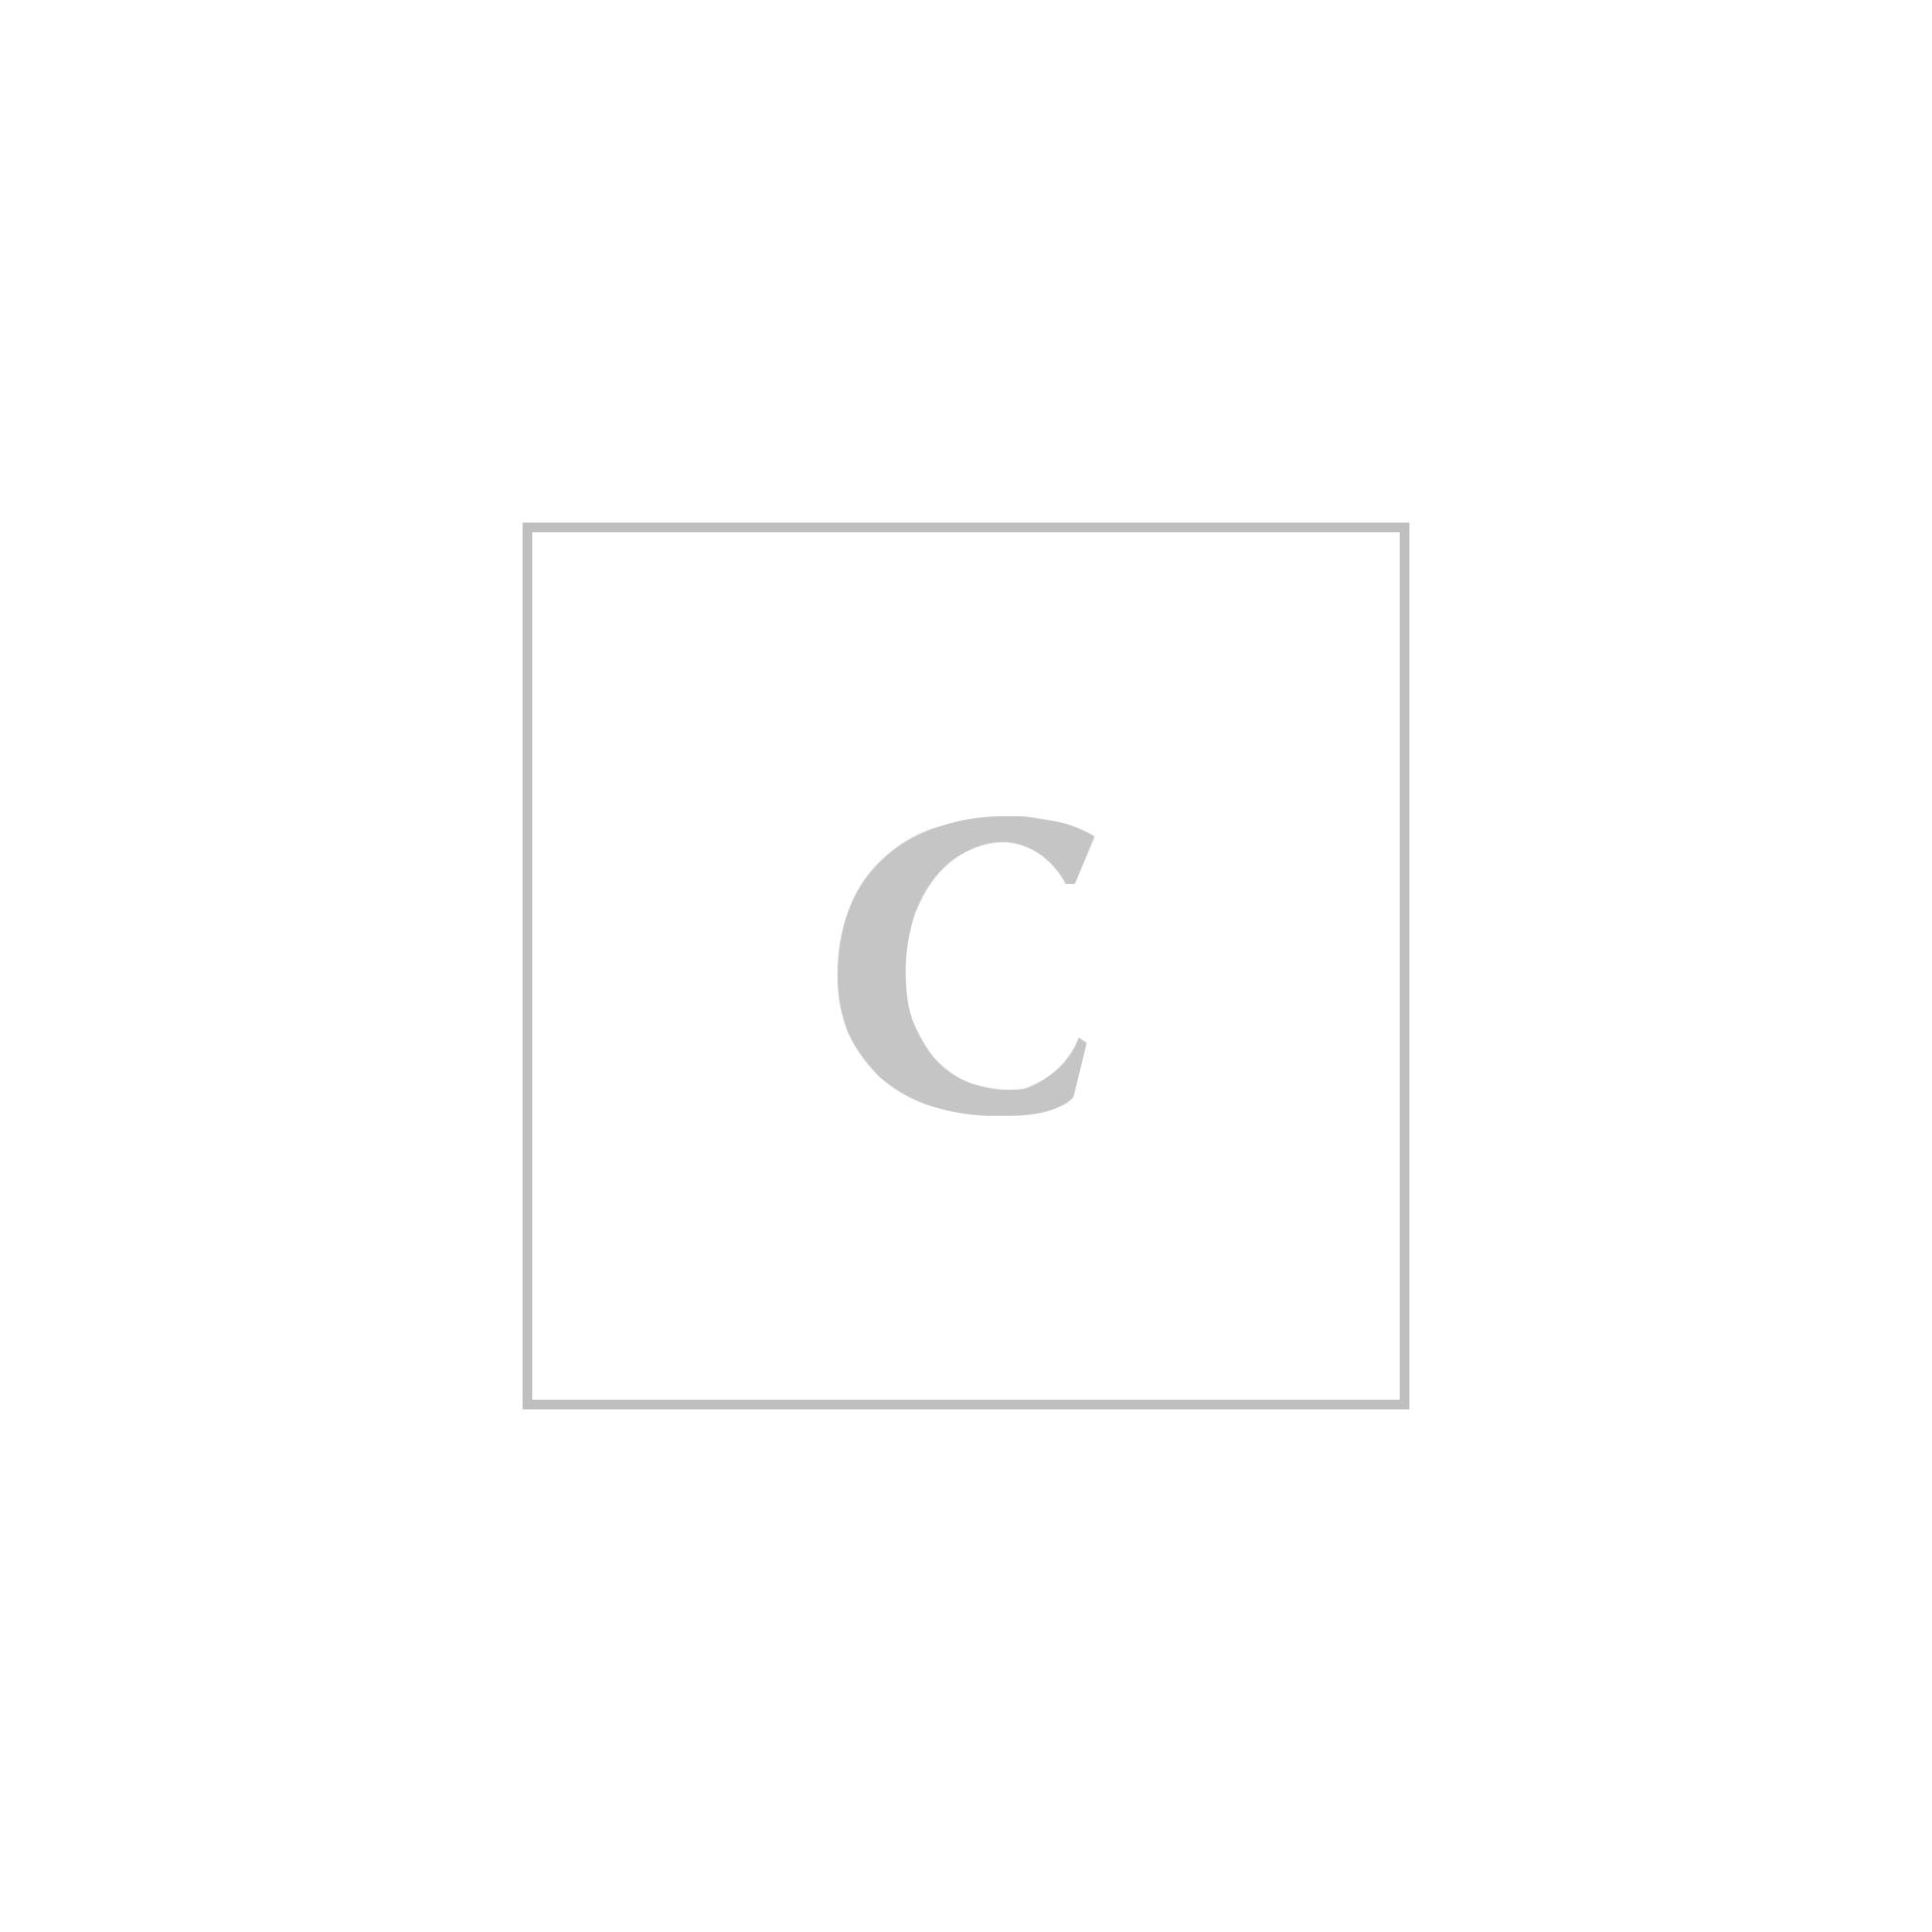 Saint laurent ysl small monogram cabas bag